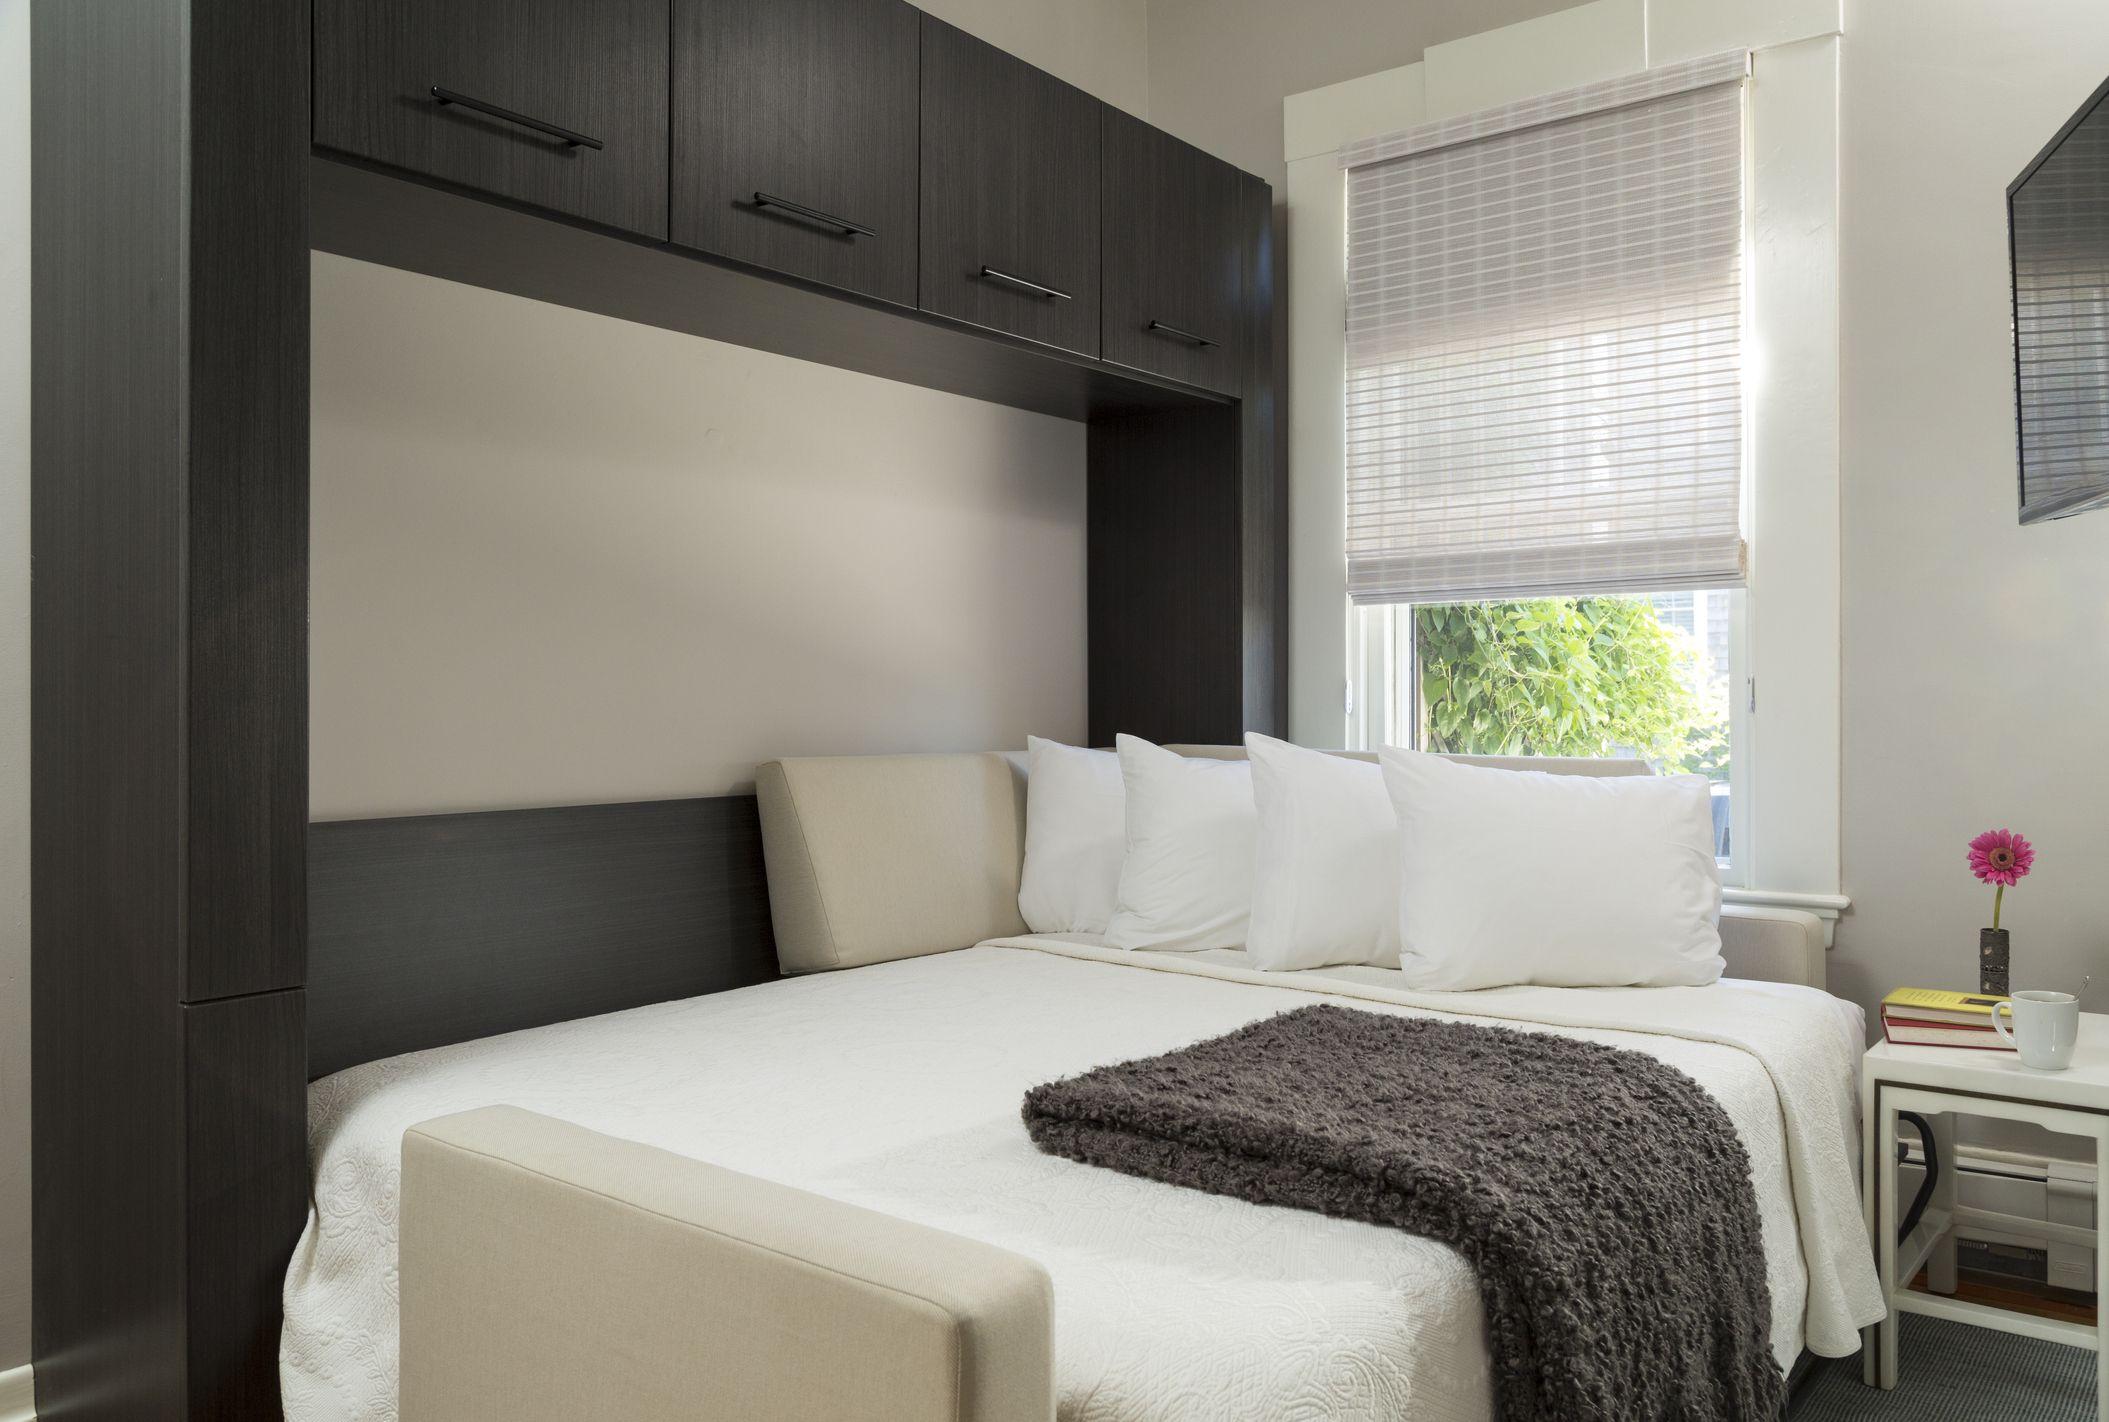 15 Diy Murphy Beds How To Build A Murphy Bed